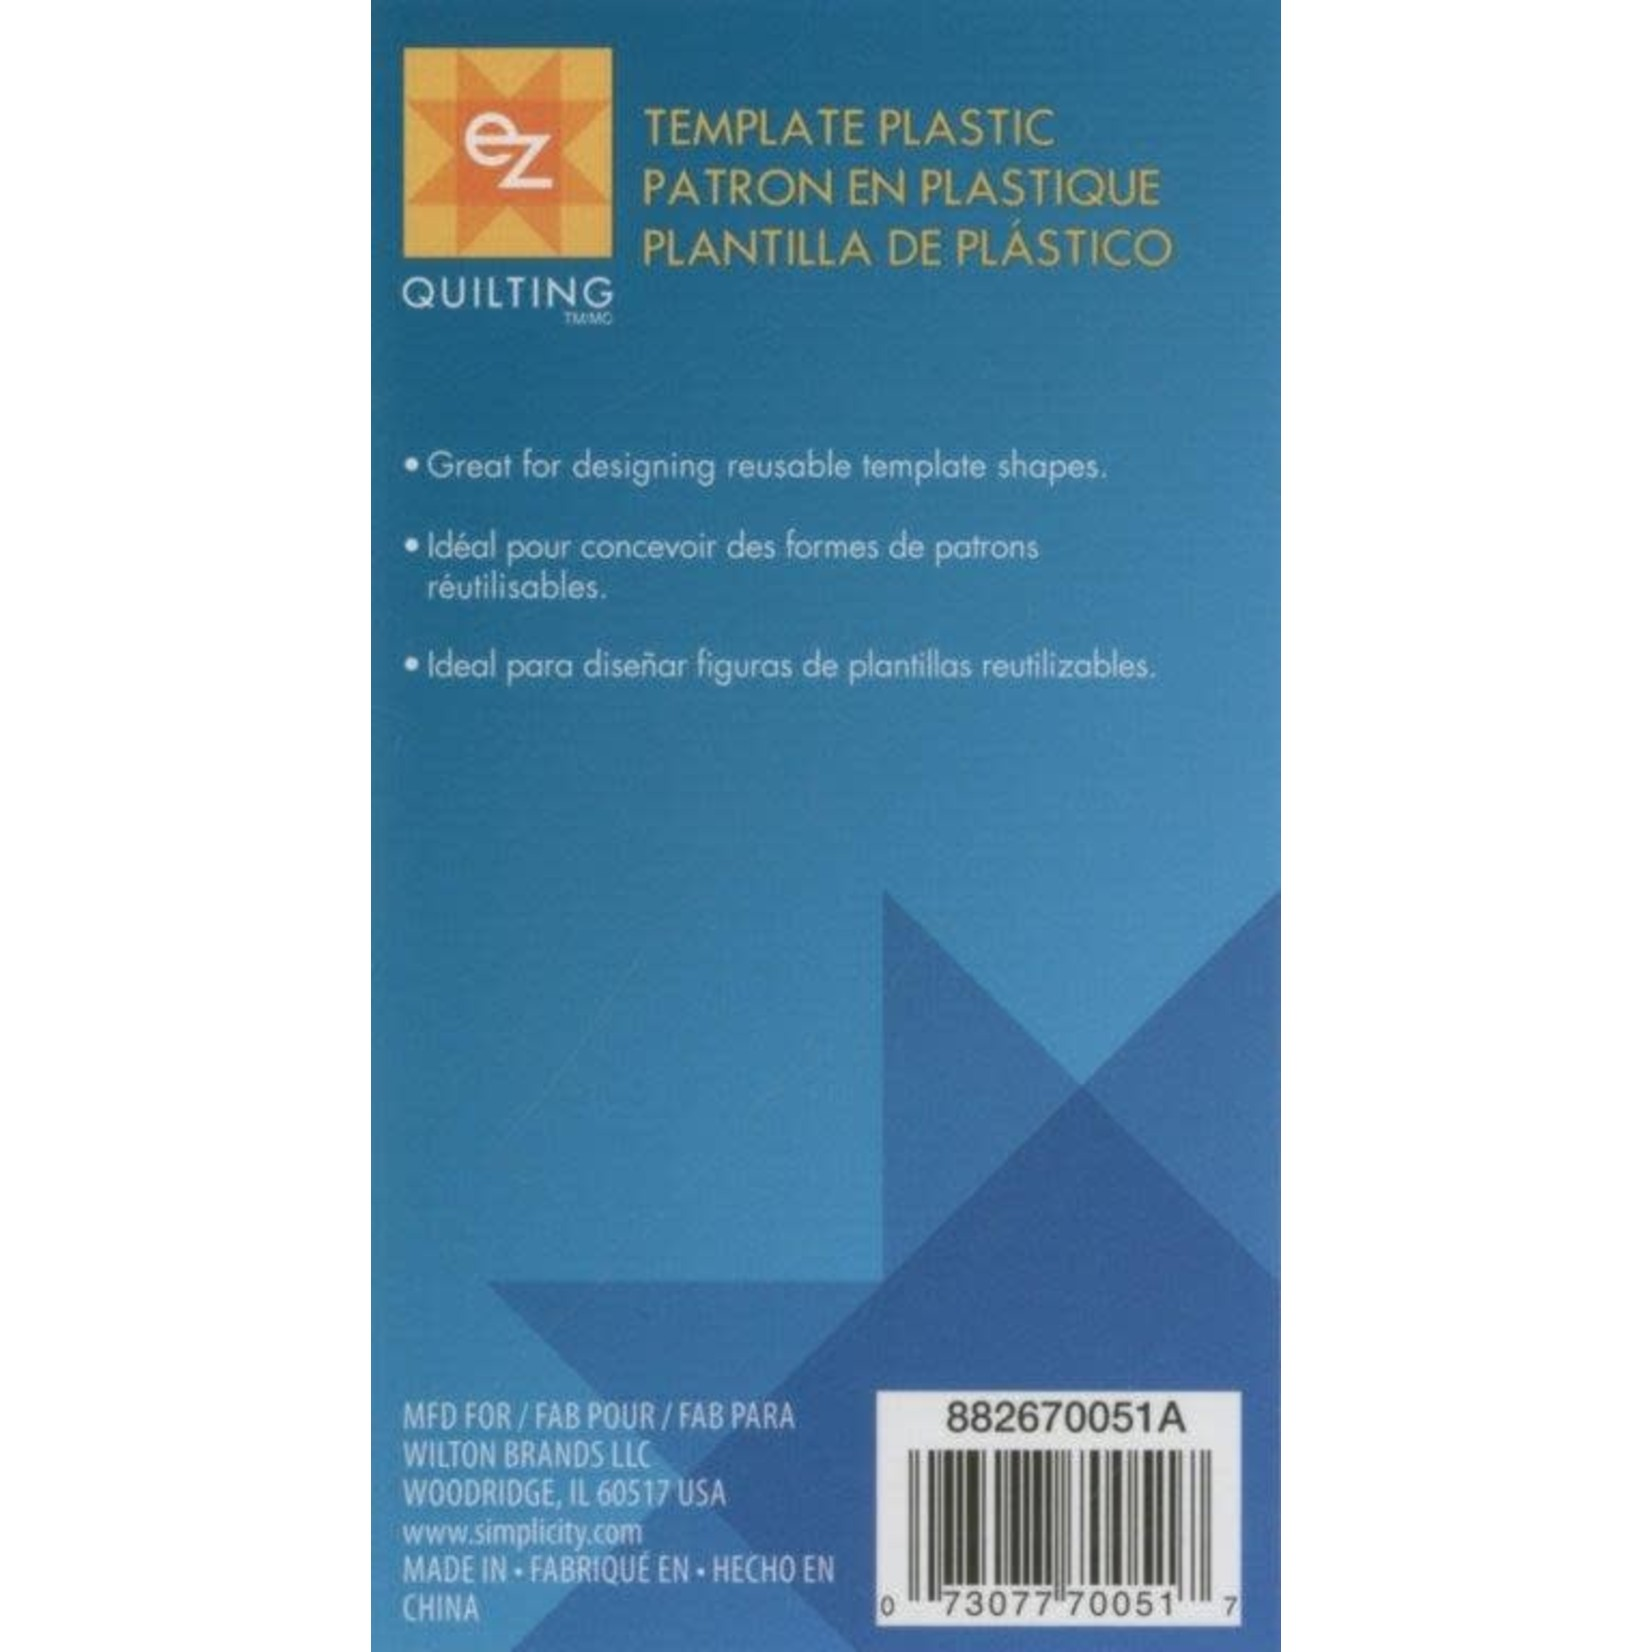 EZ Quilting Paternoplaat - Template Plastic Sheet - 30 cm x 45 cm